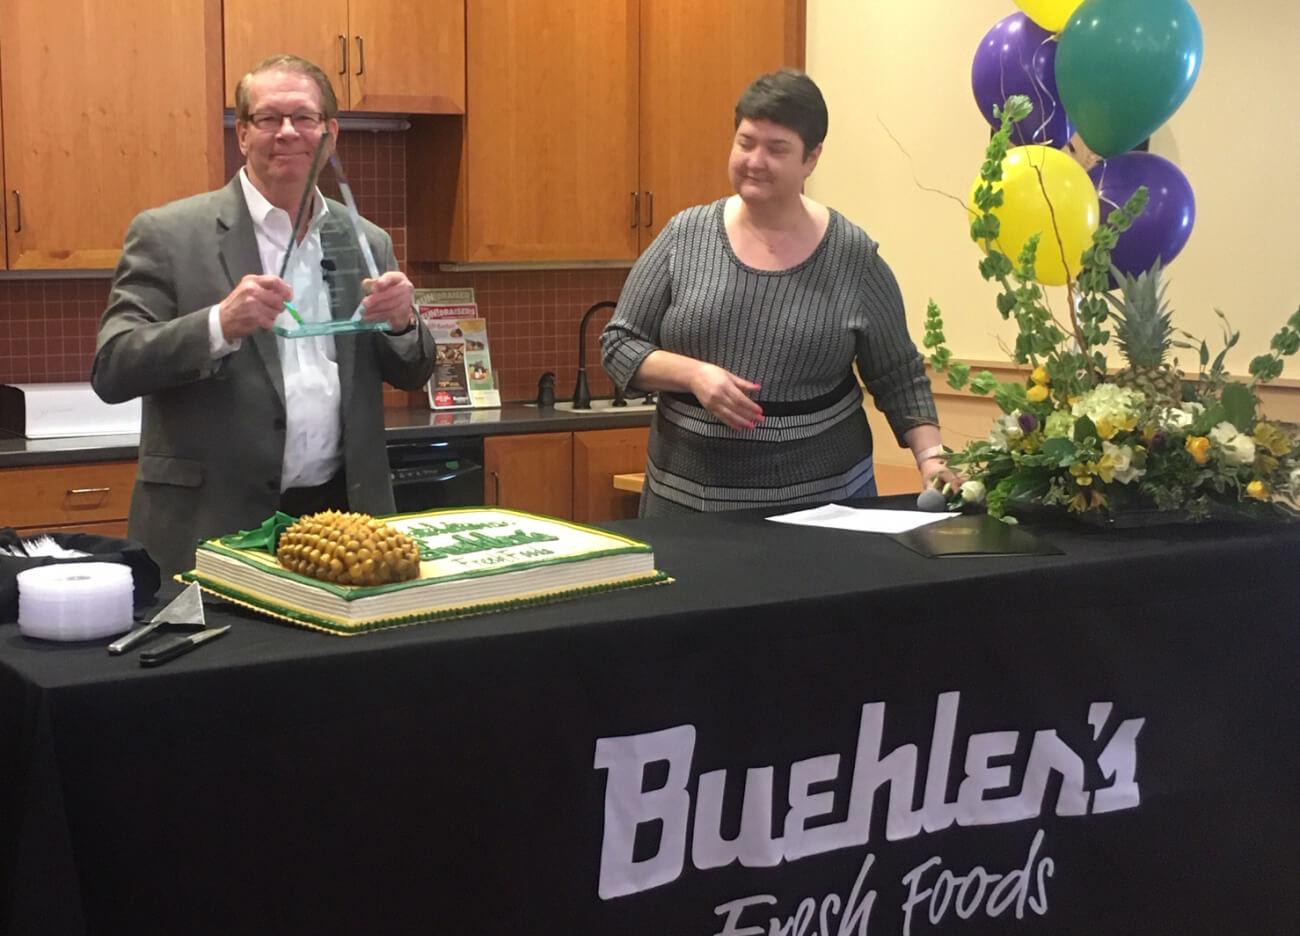 Dan Shanahan receives Pinacle Award for Buehler's